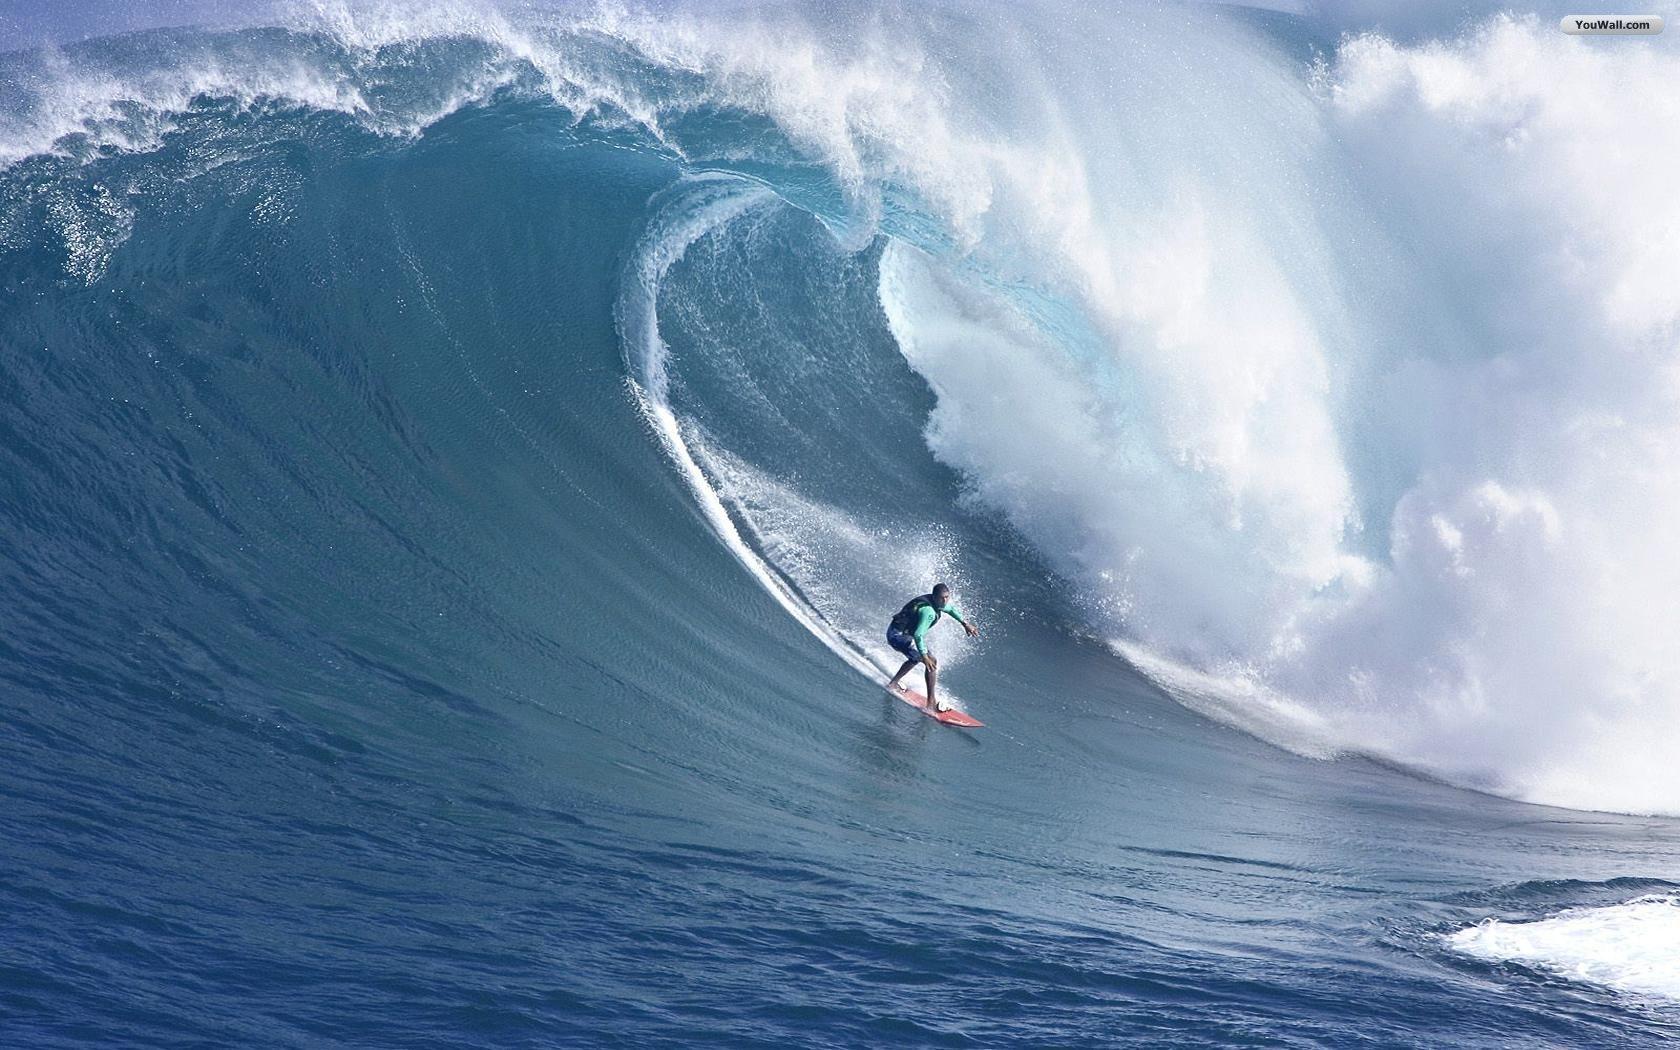 Big Wave hd Wallpaper High Quality WallpapersWallpaper DesktopHigh 1680x1050